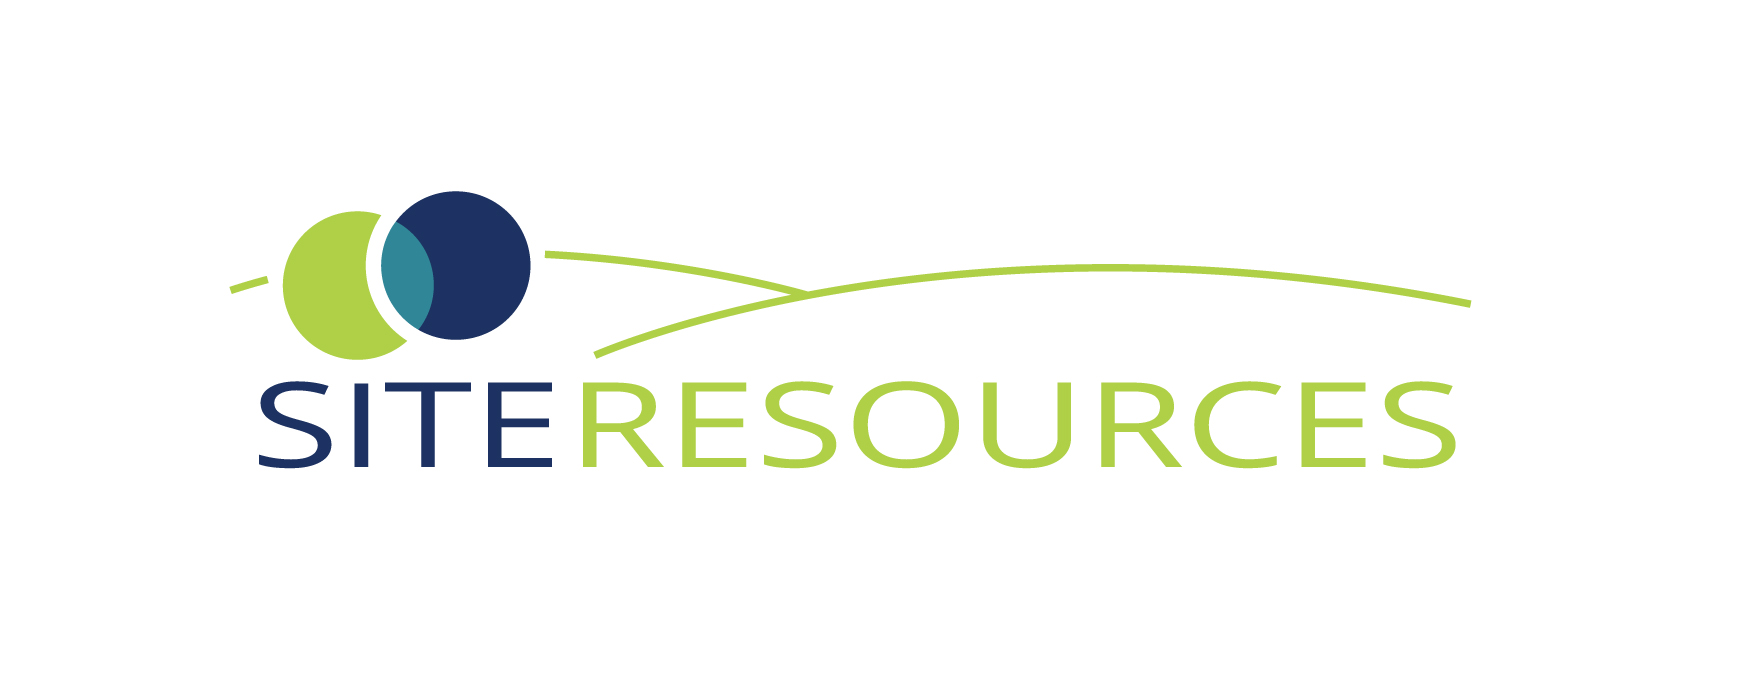 Site Resources